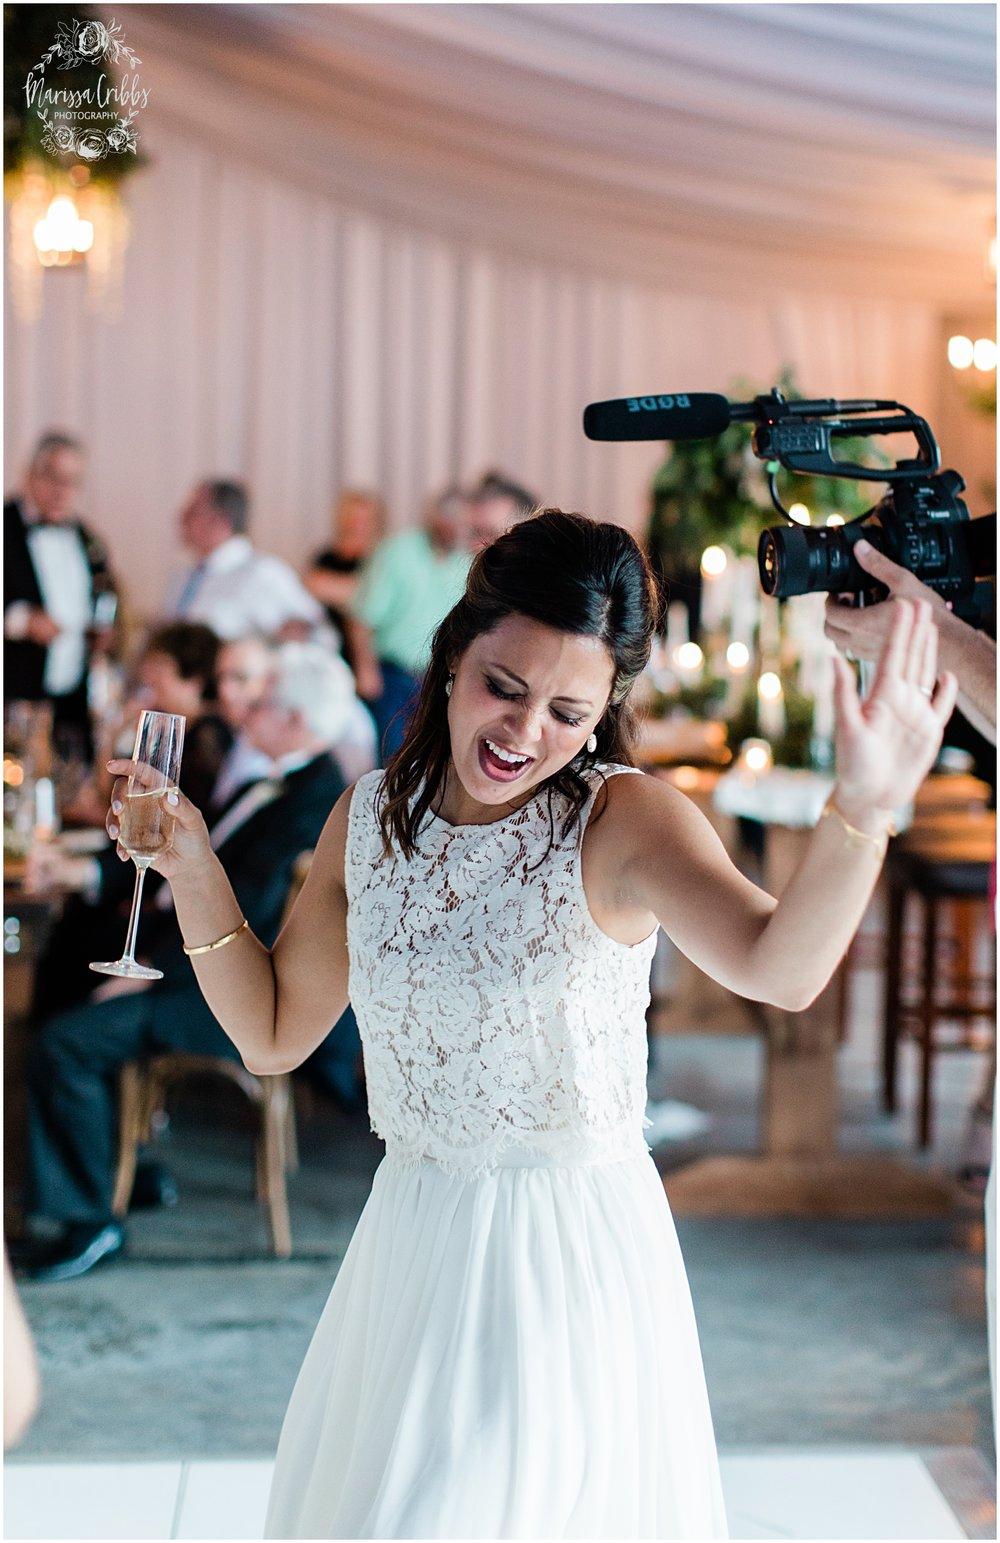 GORBY WEDDING | MARISSA CRIBBS PHOTOGRAPHY_5151.jpg